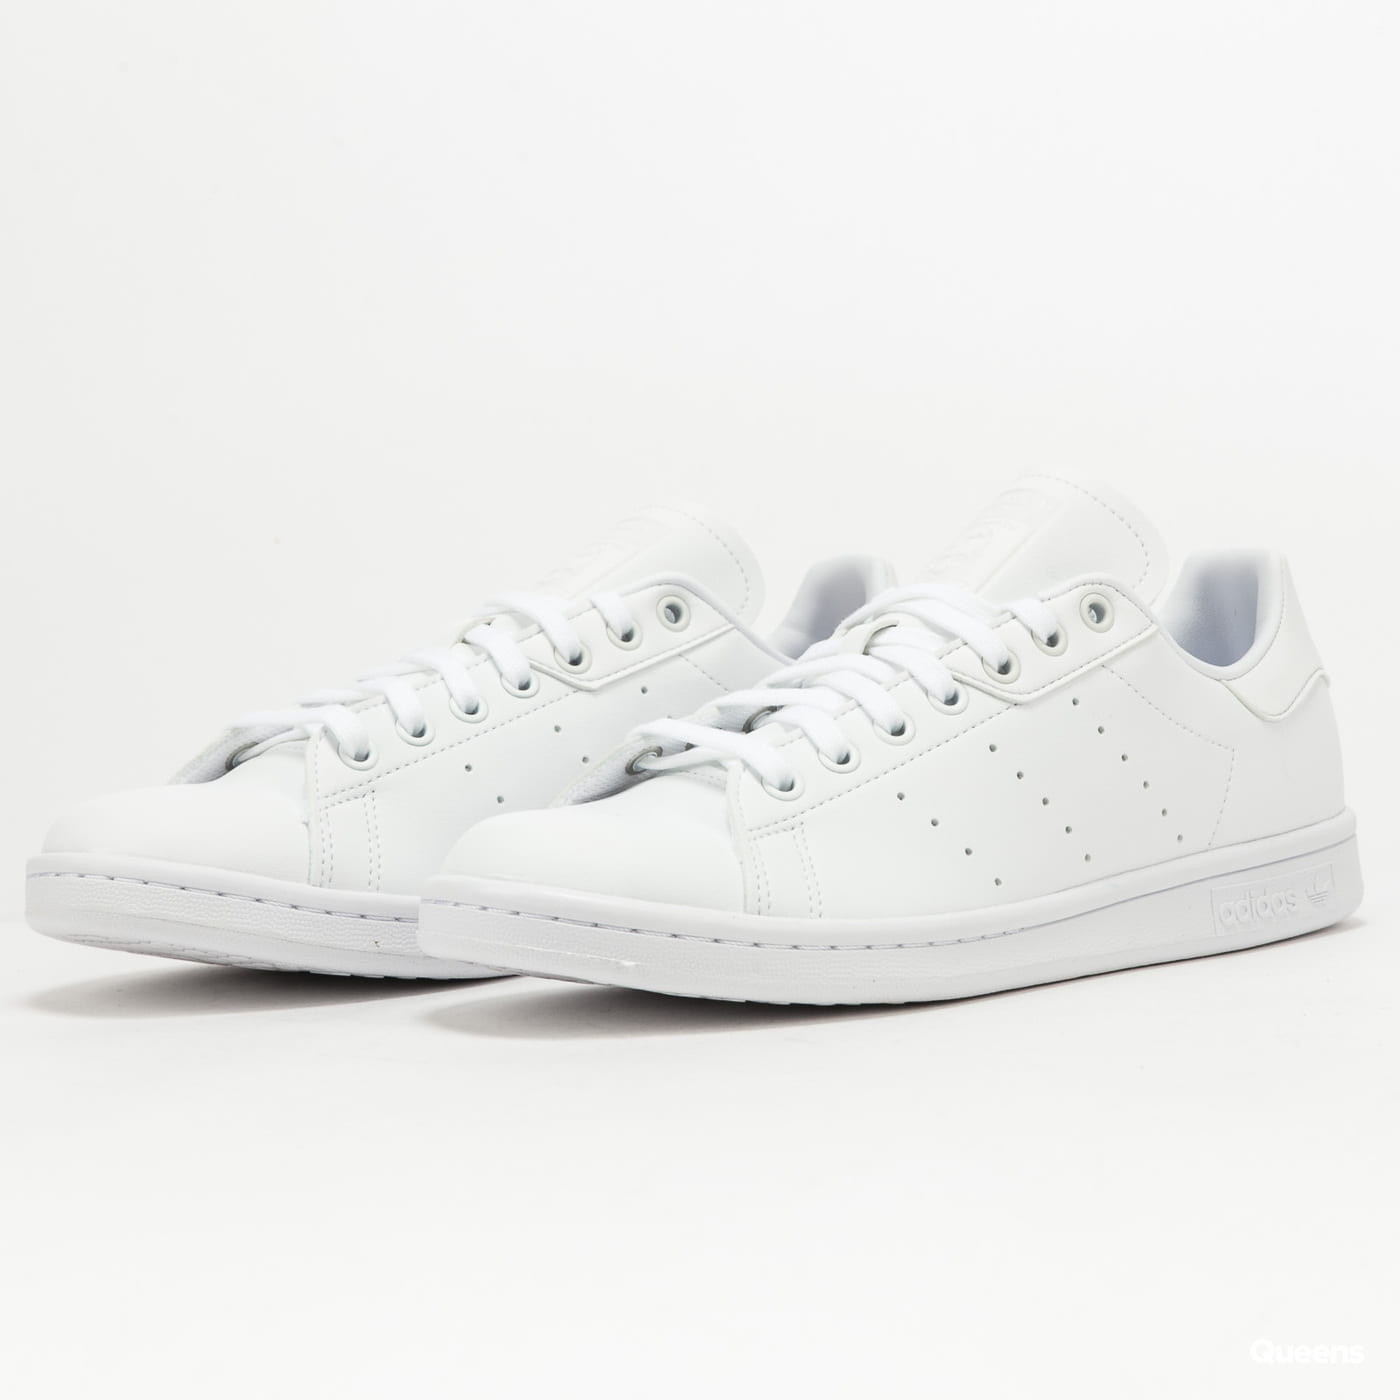 adidas Originals Stan Smith ftwwht / crywht / crywht